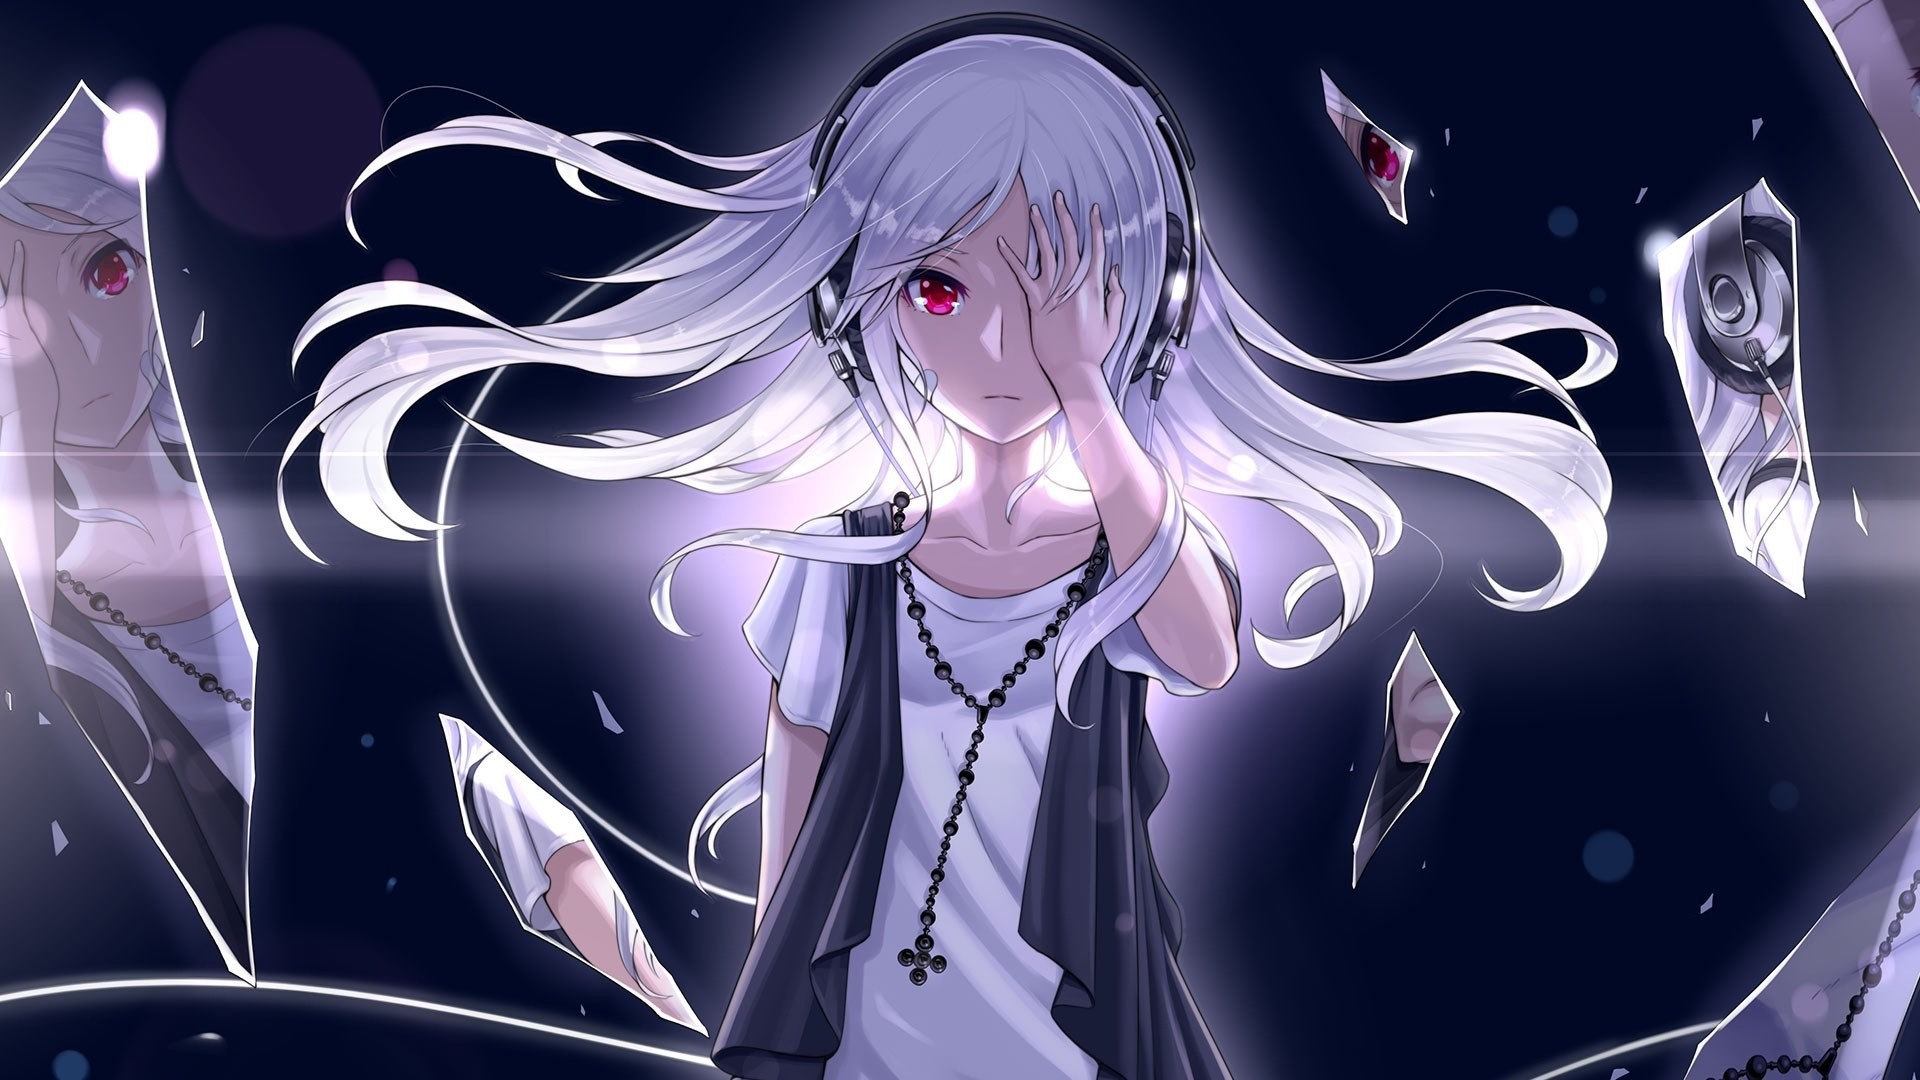 Res: 1920x1080, Anime Girl HD Desktop Wallpaper 61371